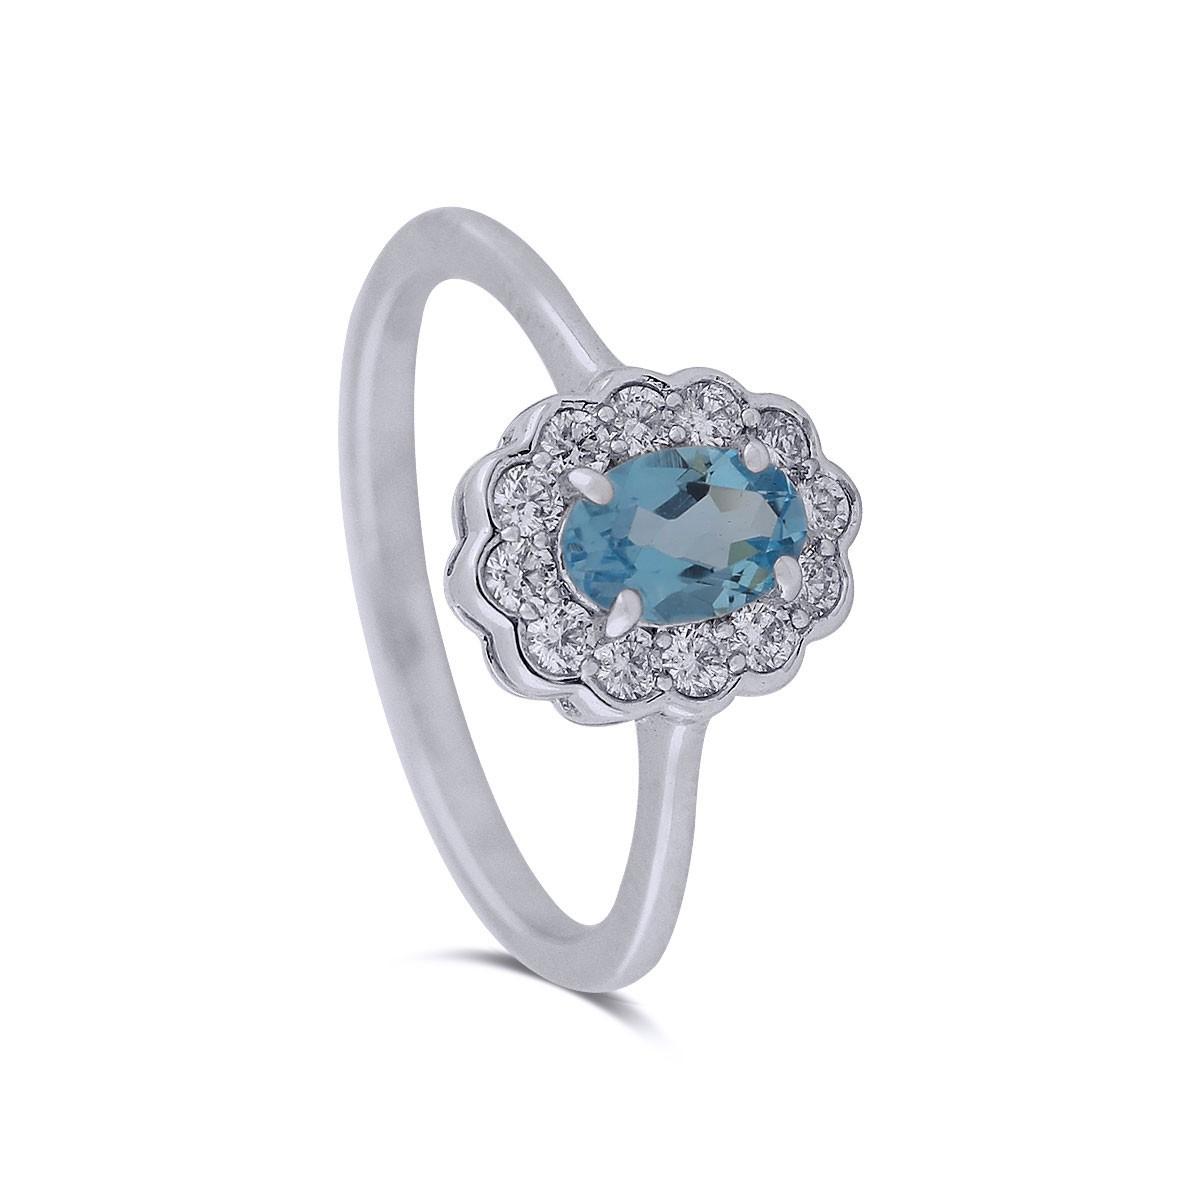 Sappho White Gold Diamond Ring